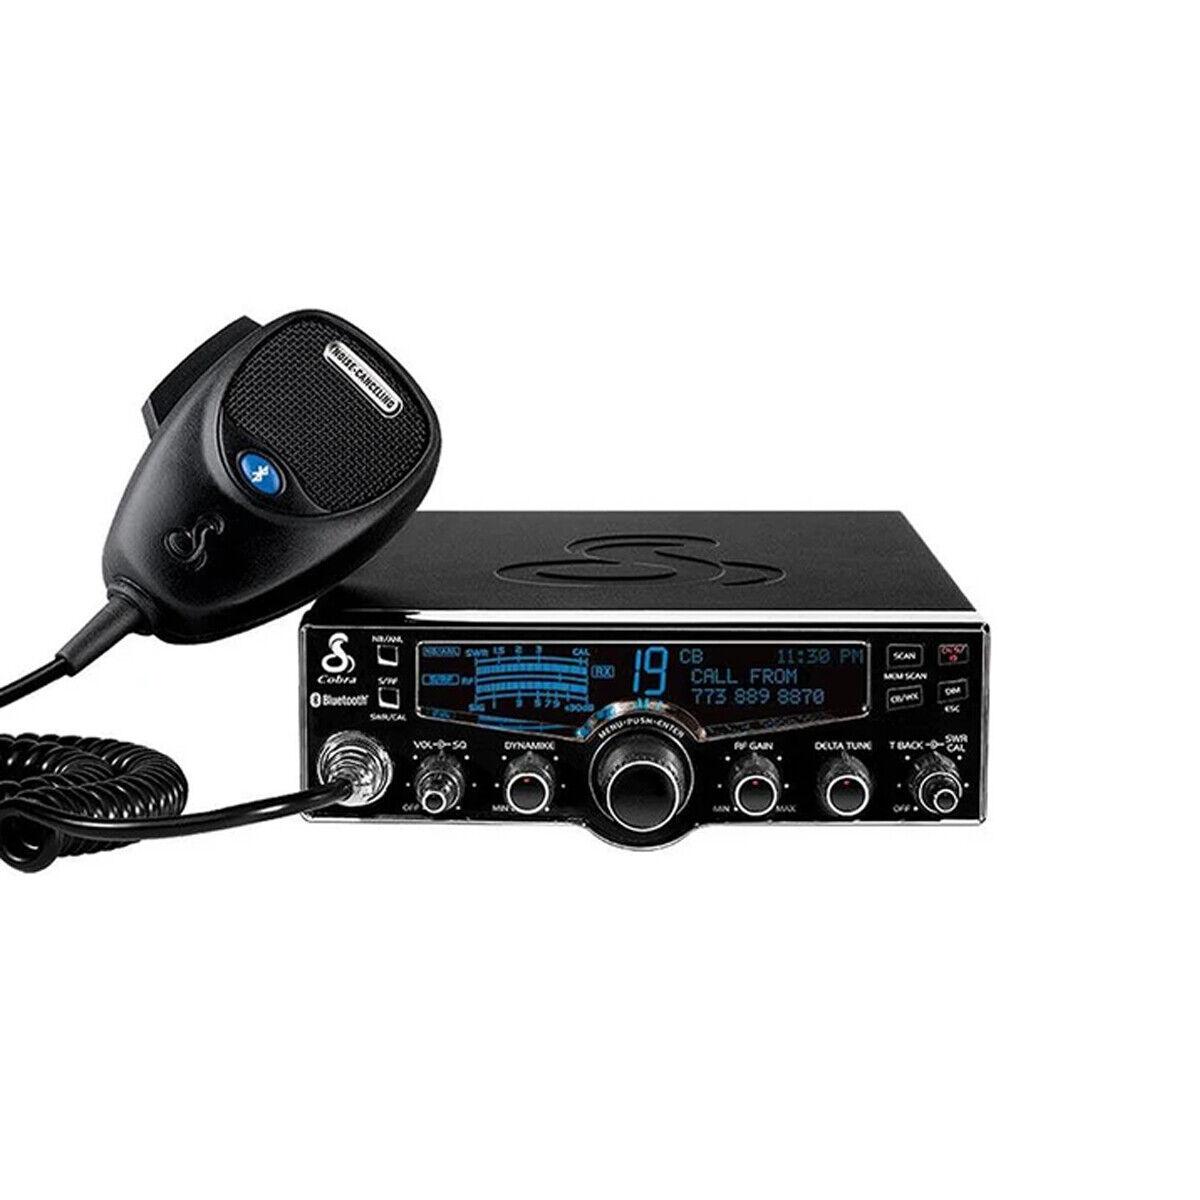 www-bestelectronicsoutlet-com Cobra Classic CB Radio with Bluetooth ( 29 LX BT )